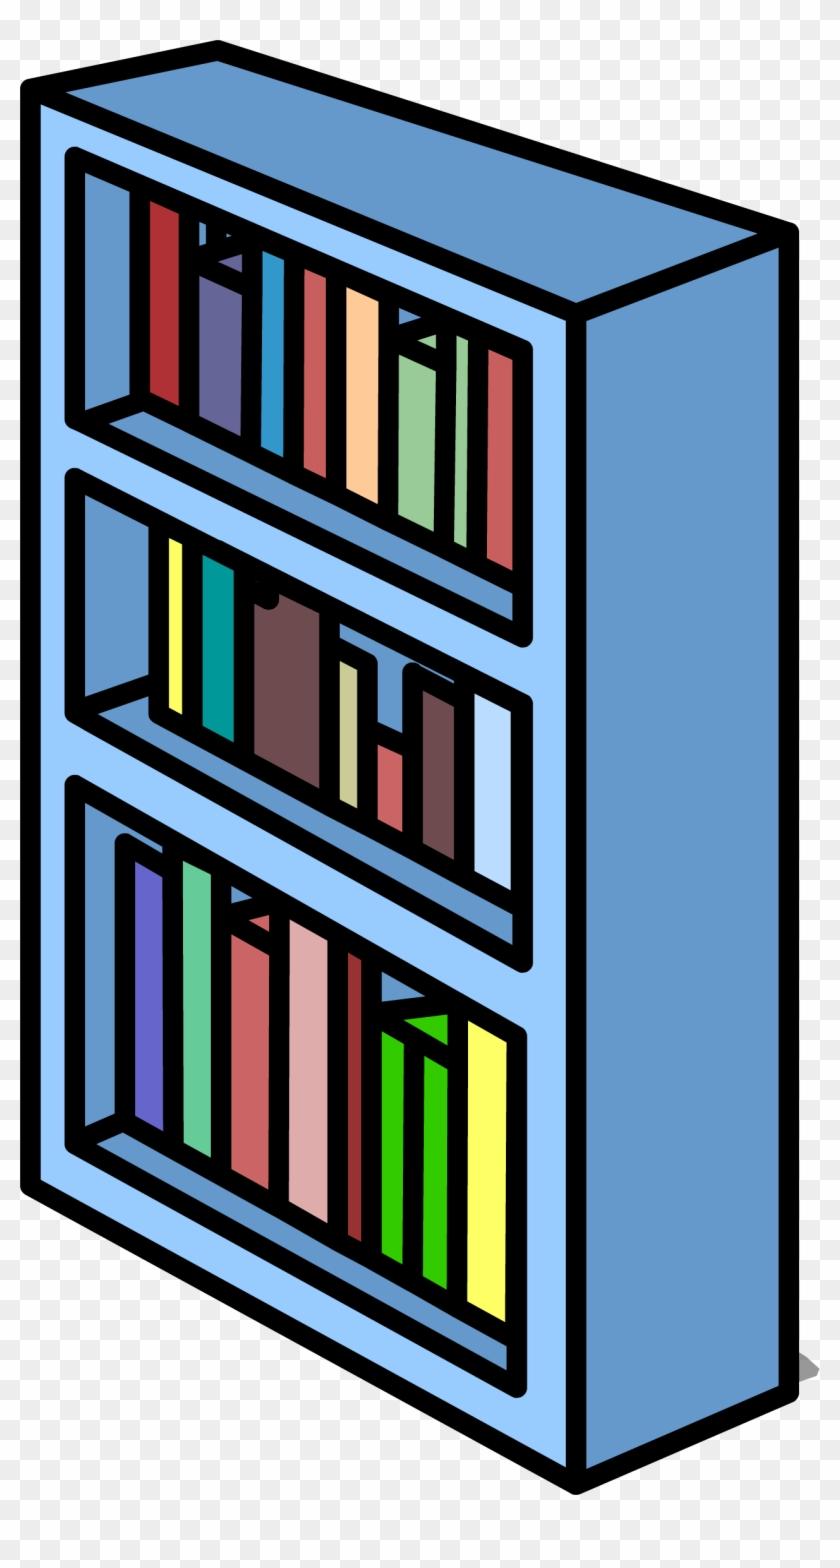 Bookshelf clipart long. Empty clip art transparent